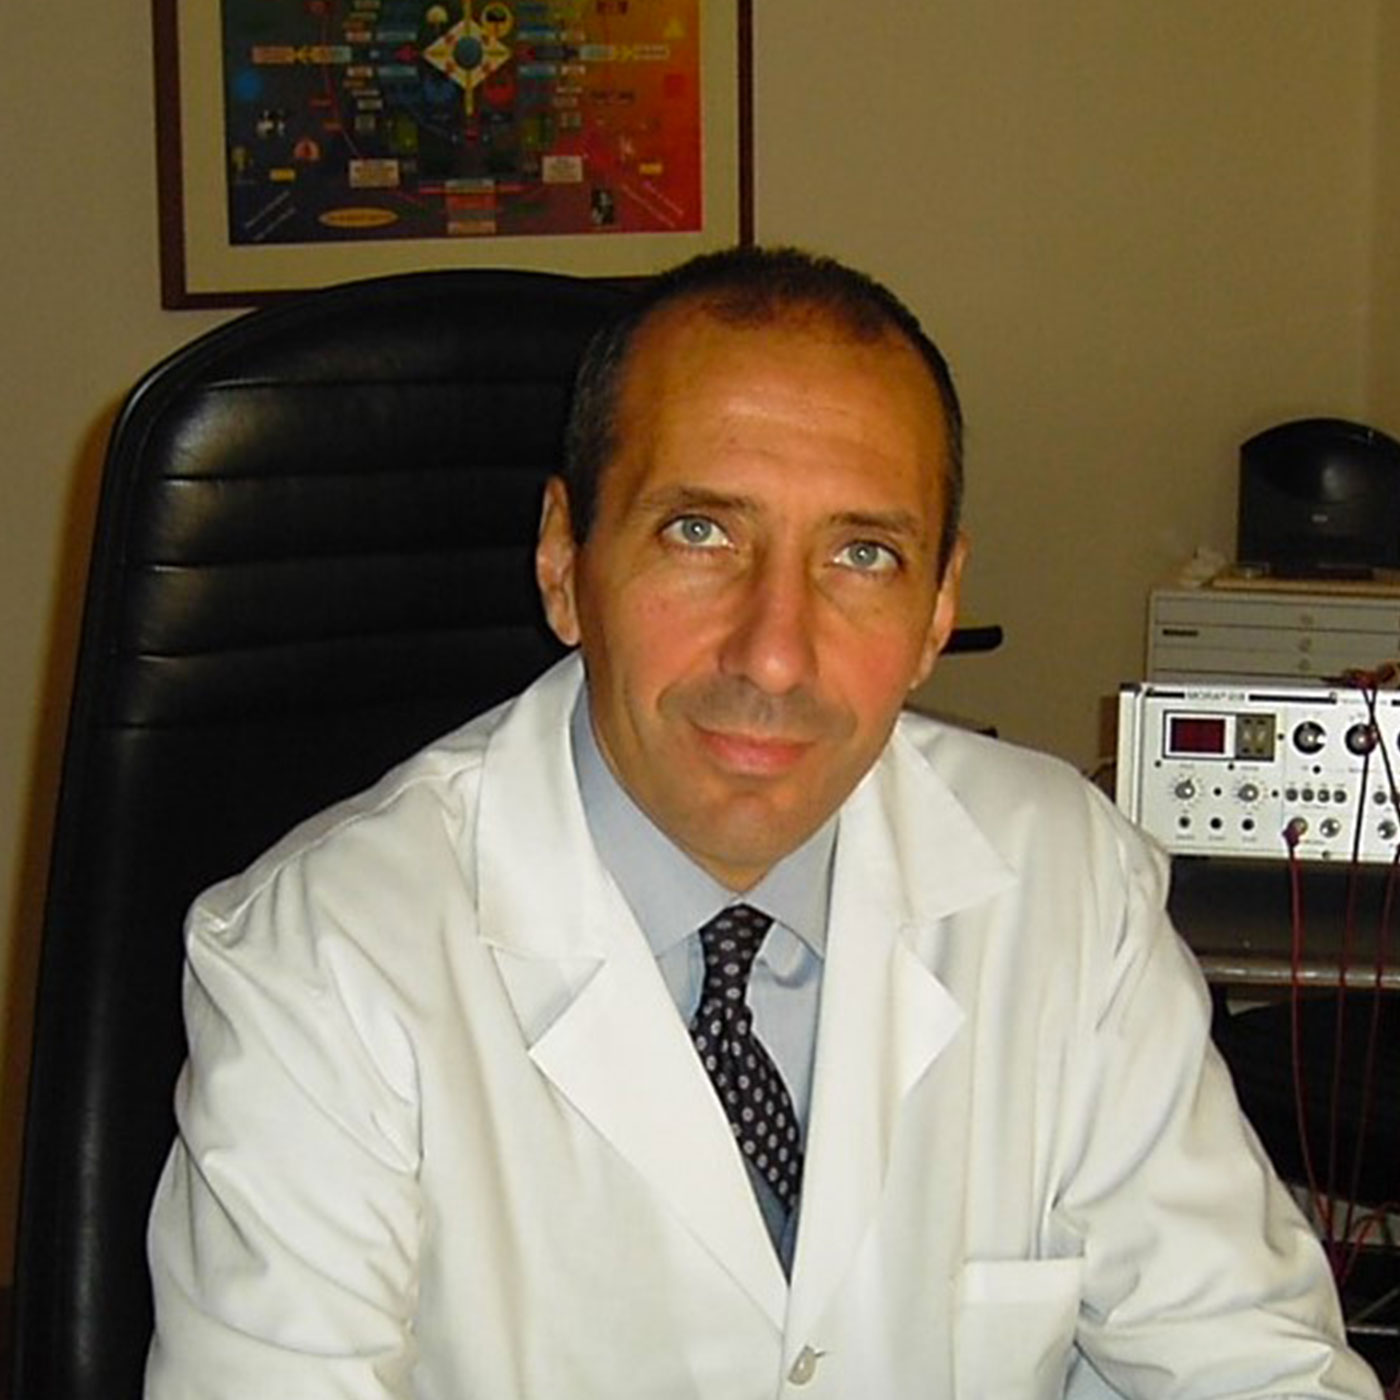 Salvatore Simeone